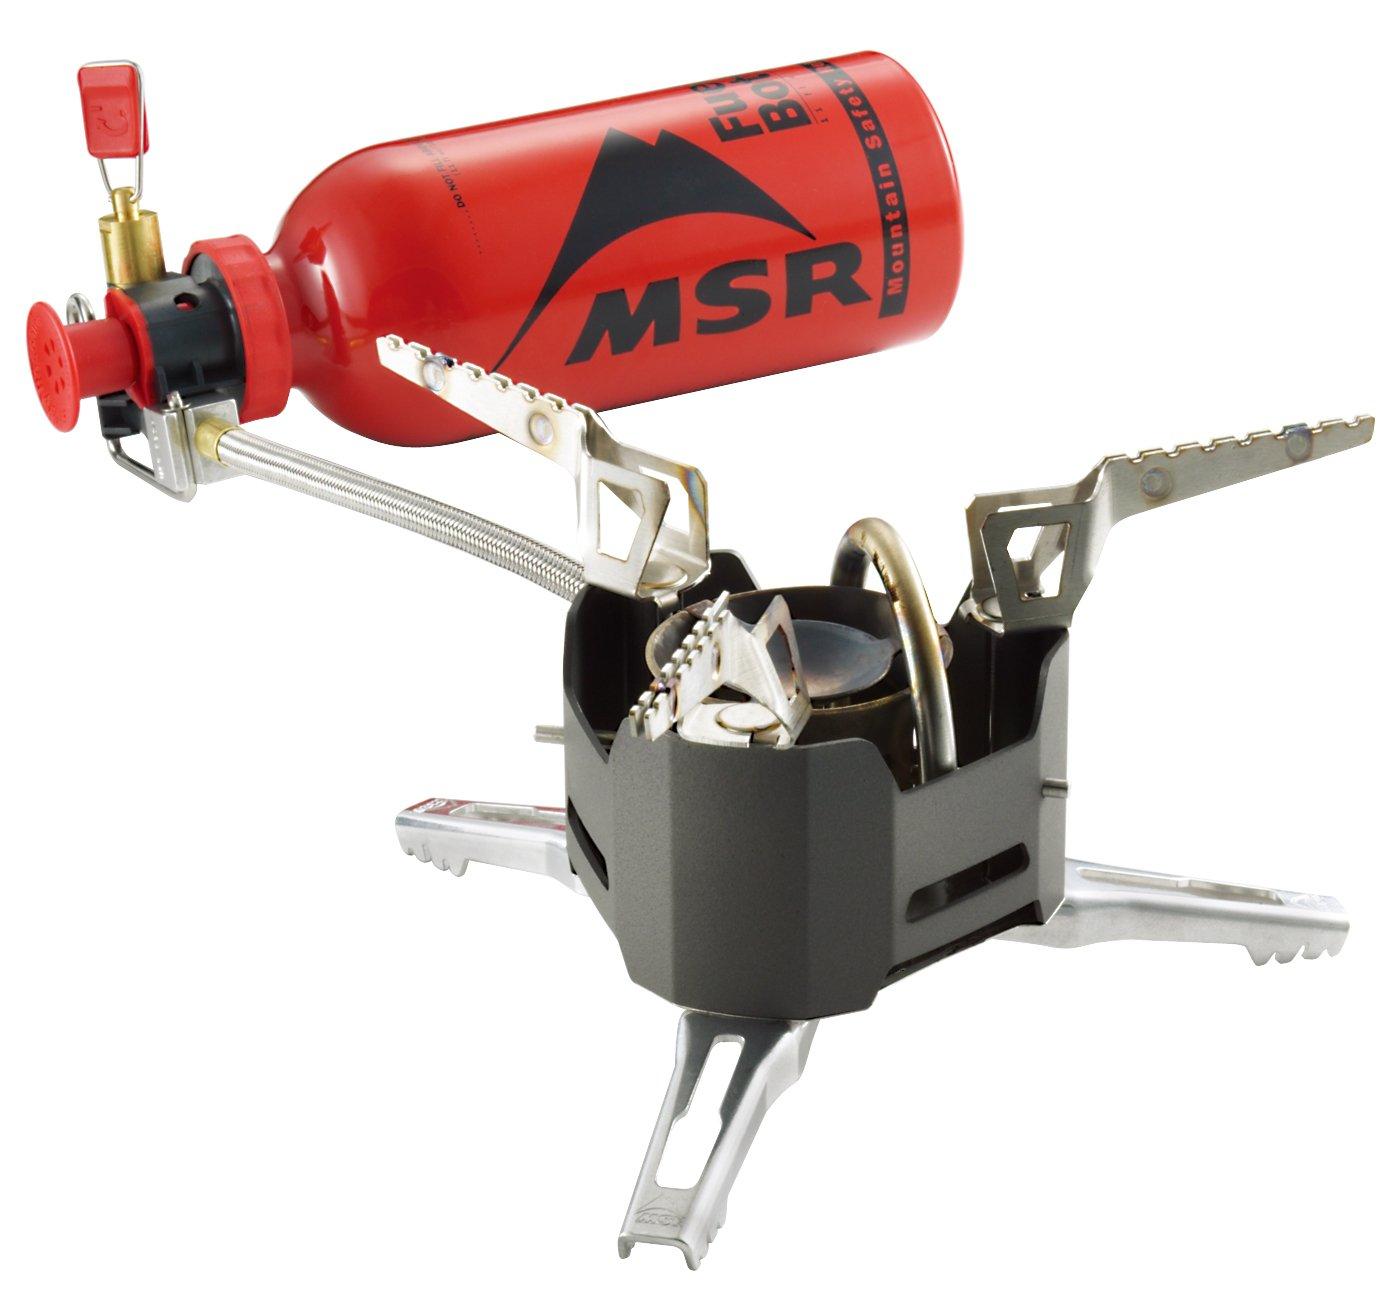 MSR 高地用ストーブ XGKEX  36043 【日本正規品】 B000EUMKFO